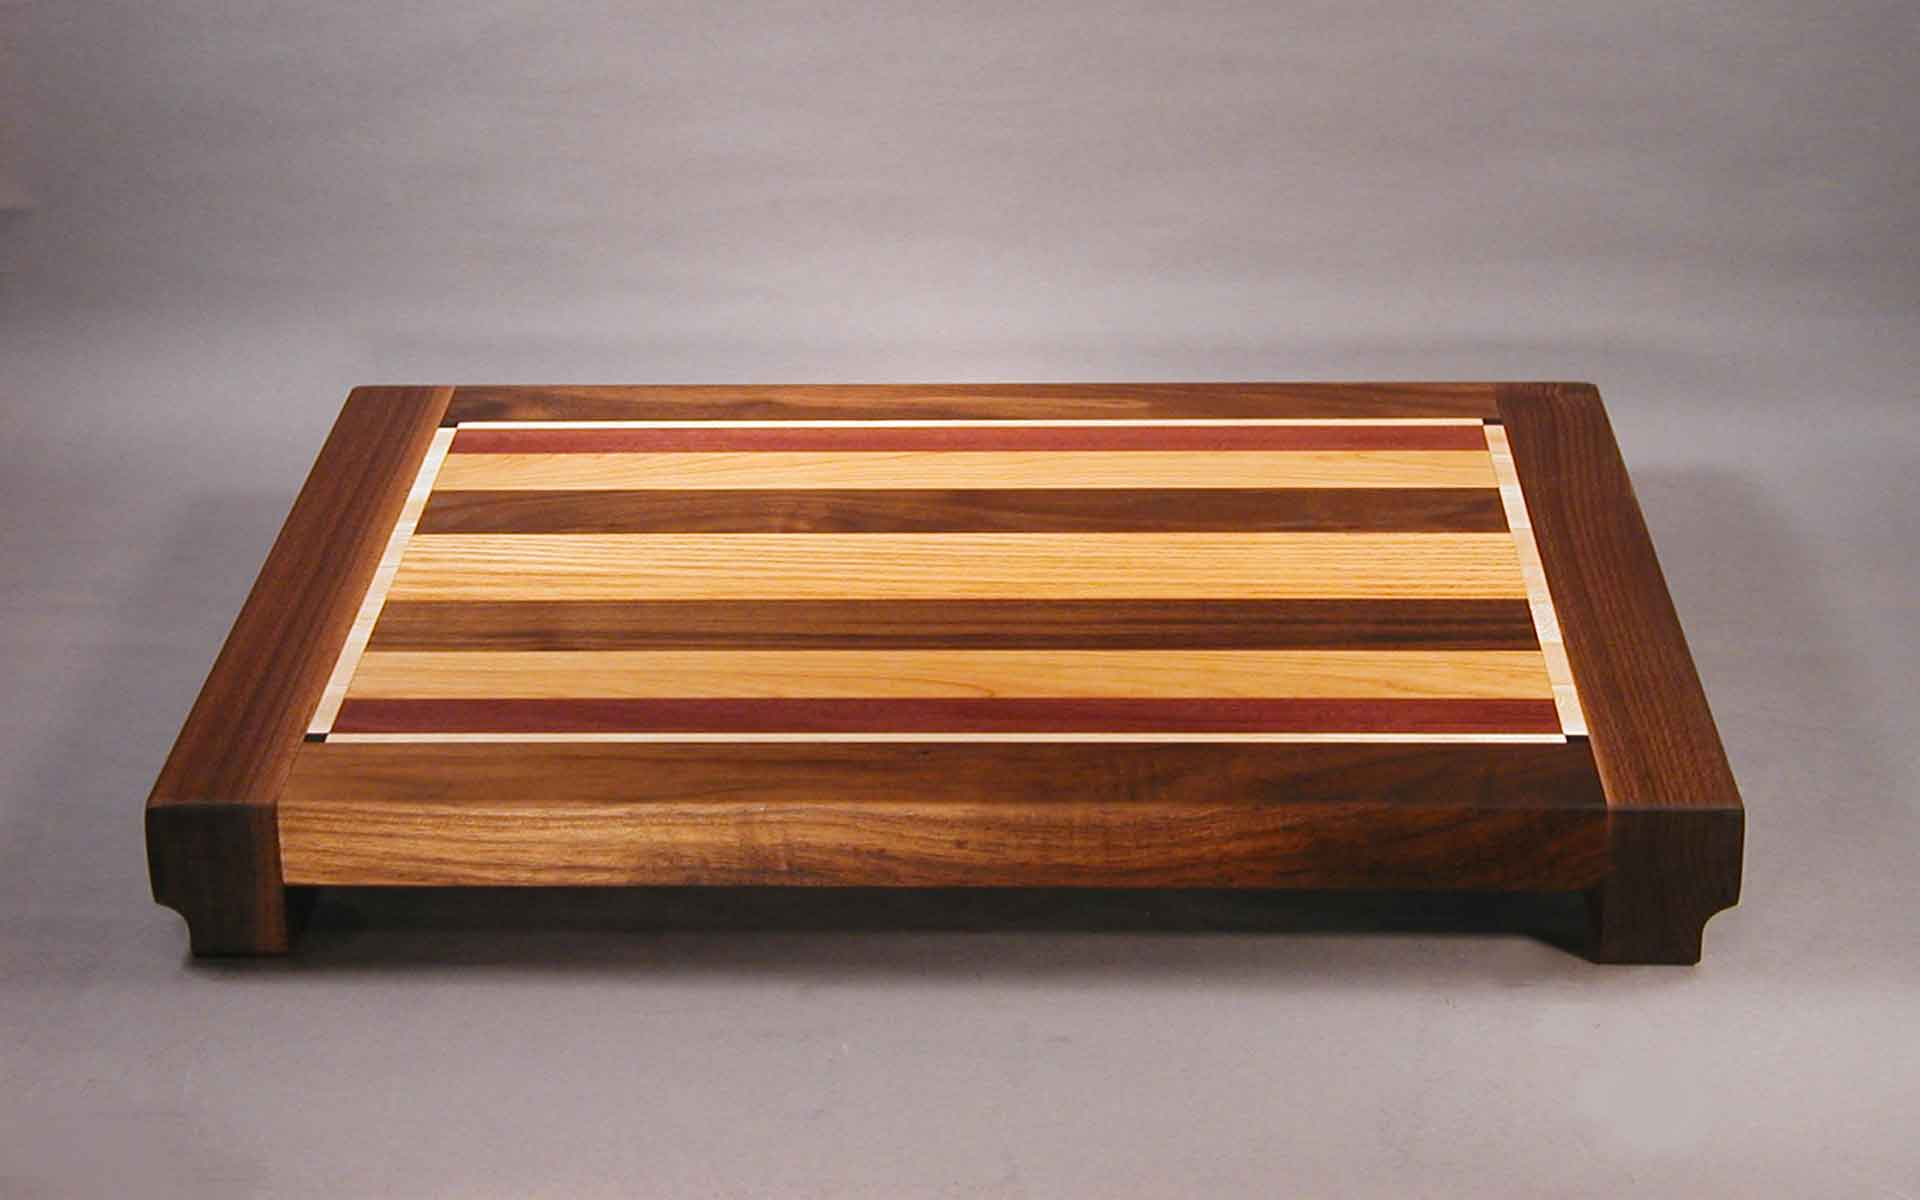 end grain chopping blocks : quilting cutting boards - Adamdwight.com